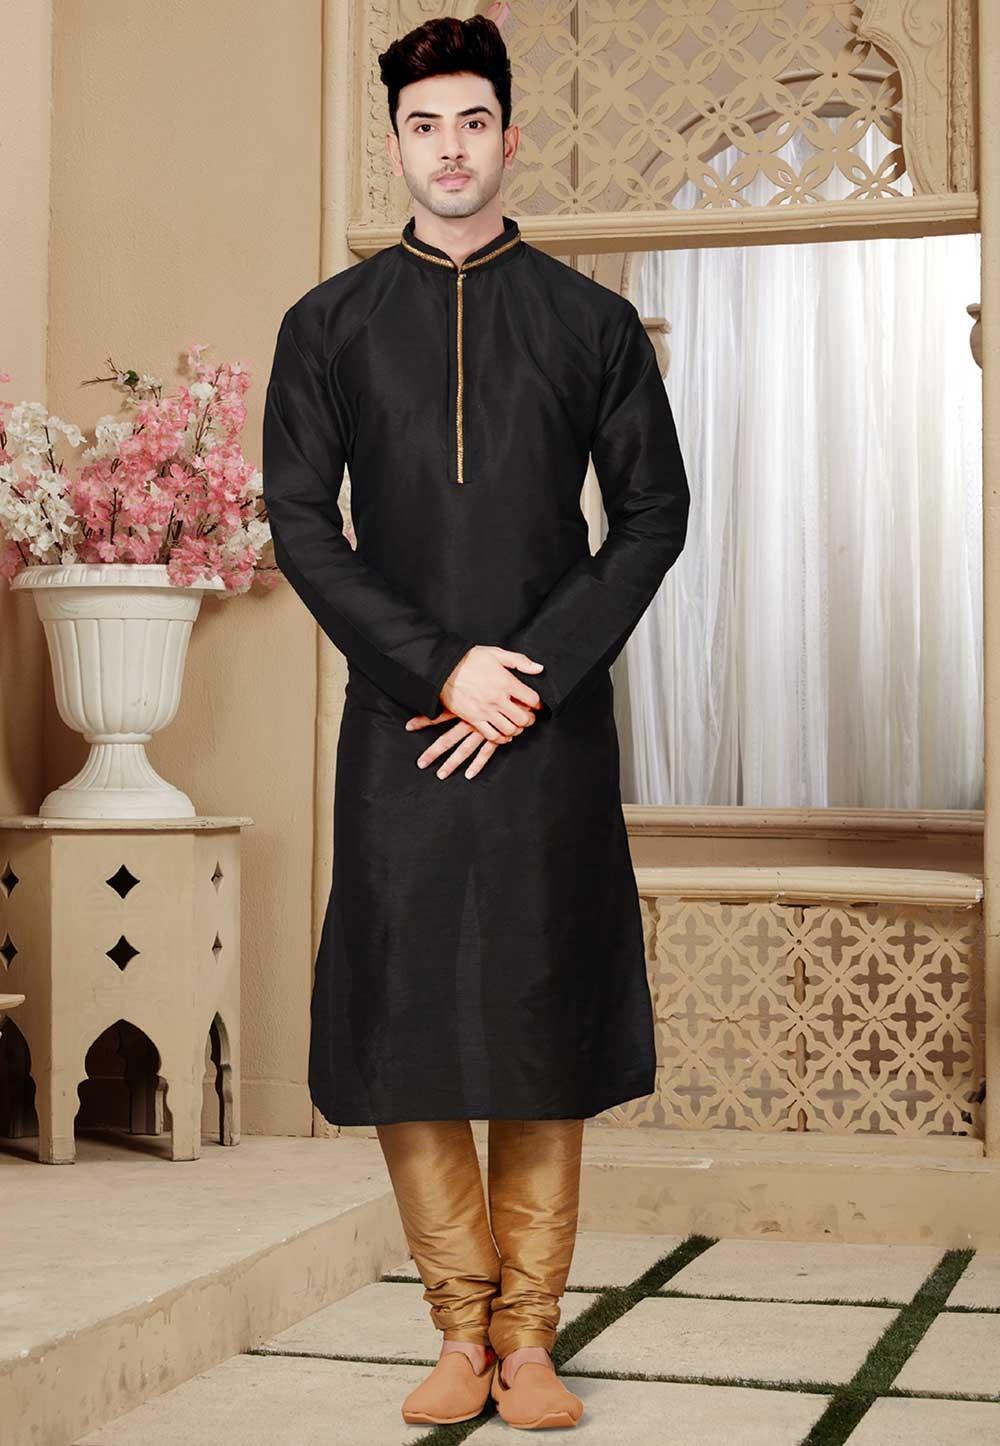 Buy Black Color Party Wear Designer Kurta Pajama Wedding